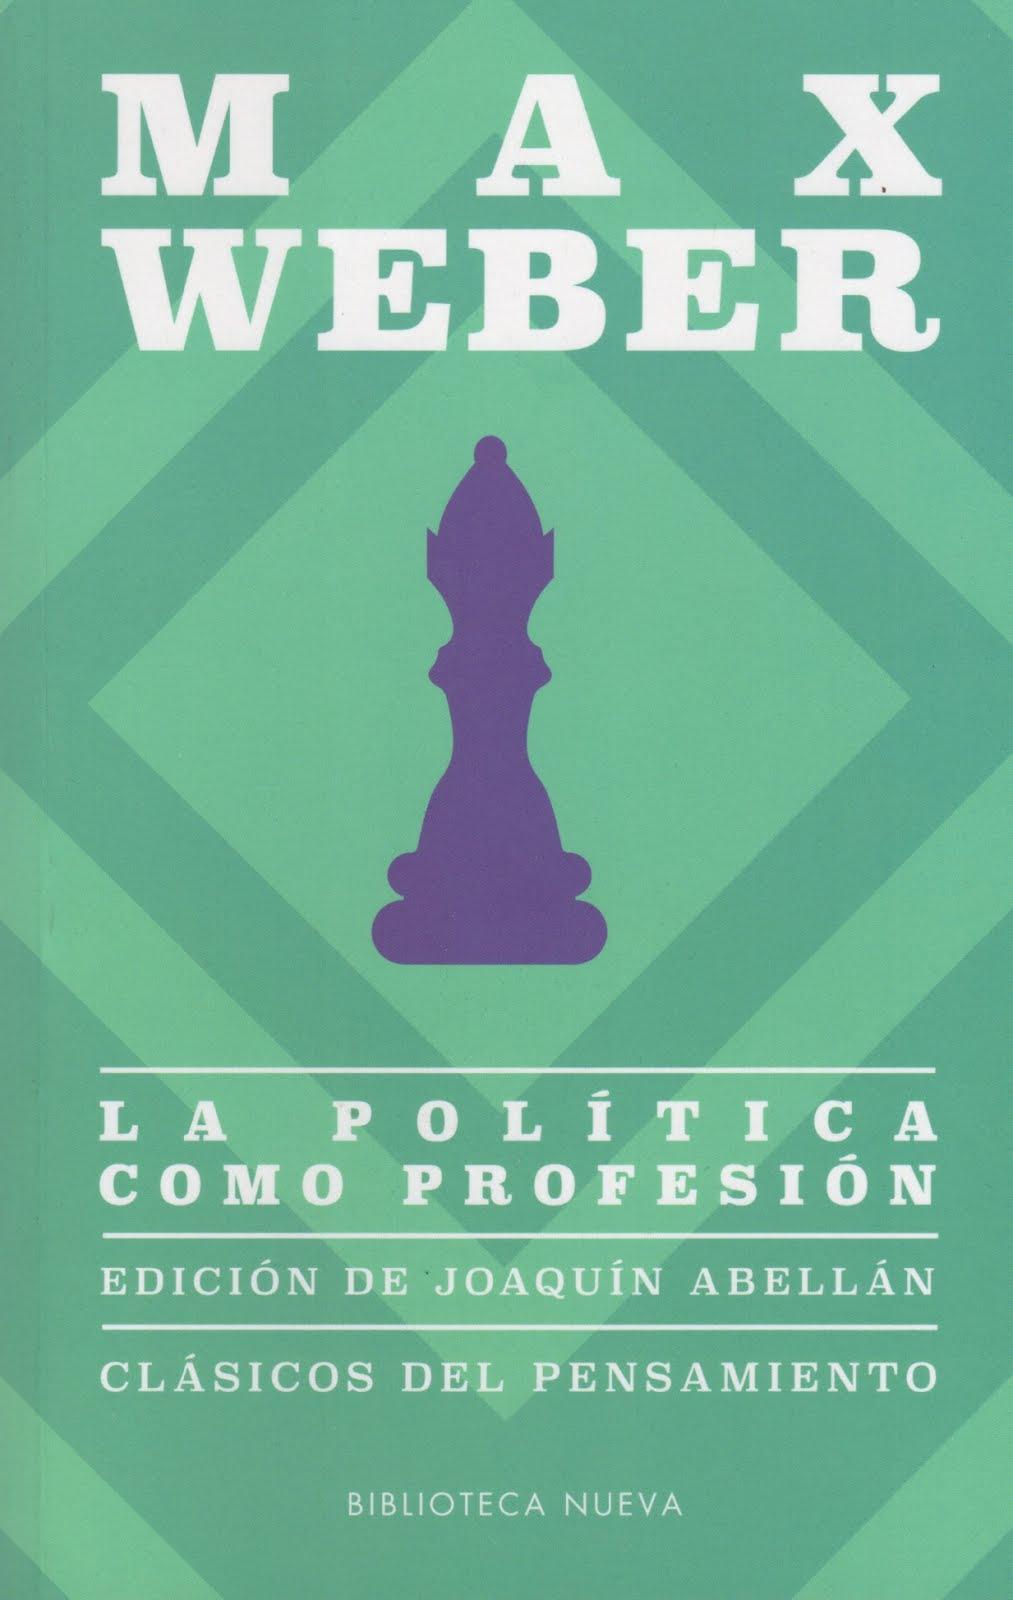 Max Weber (La política como profesión)